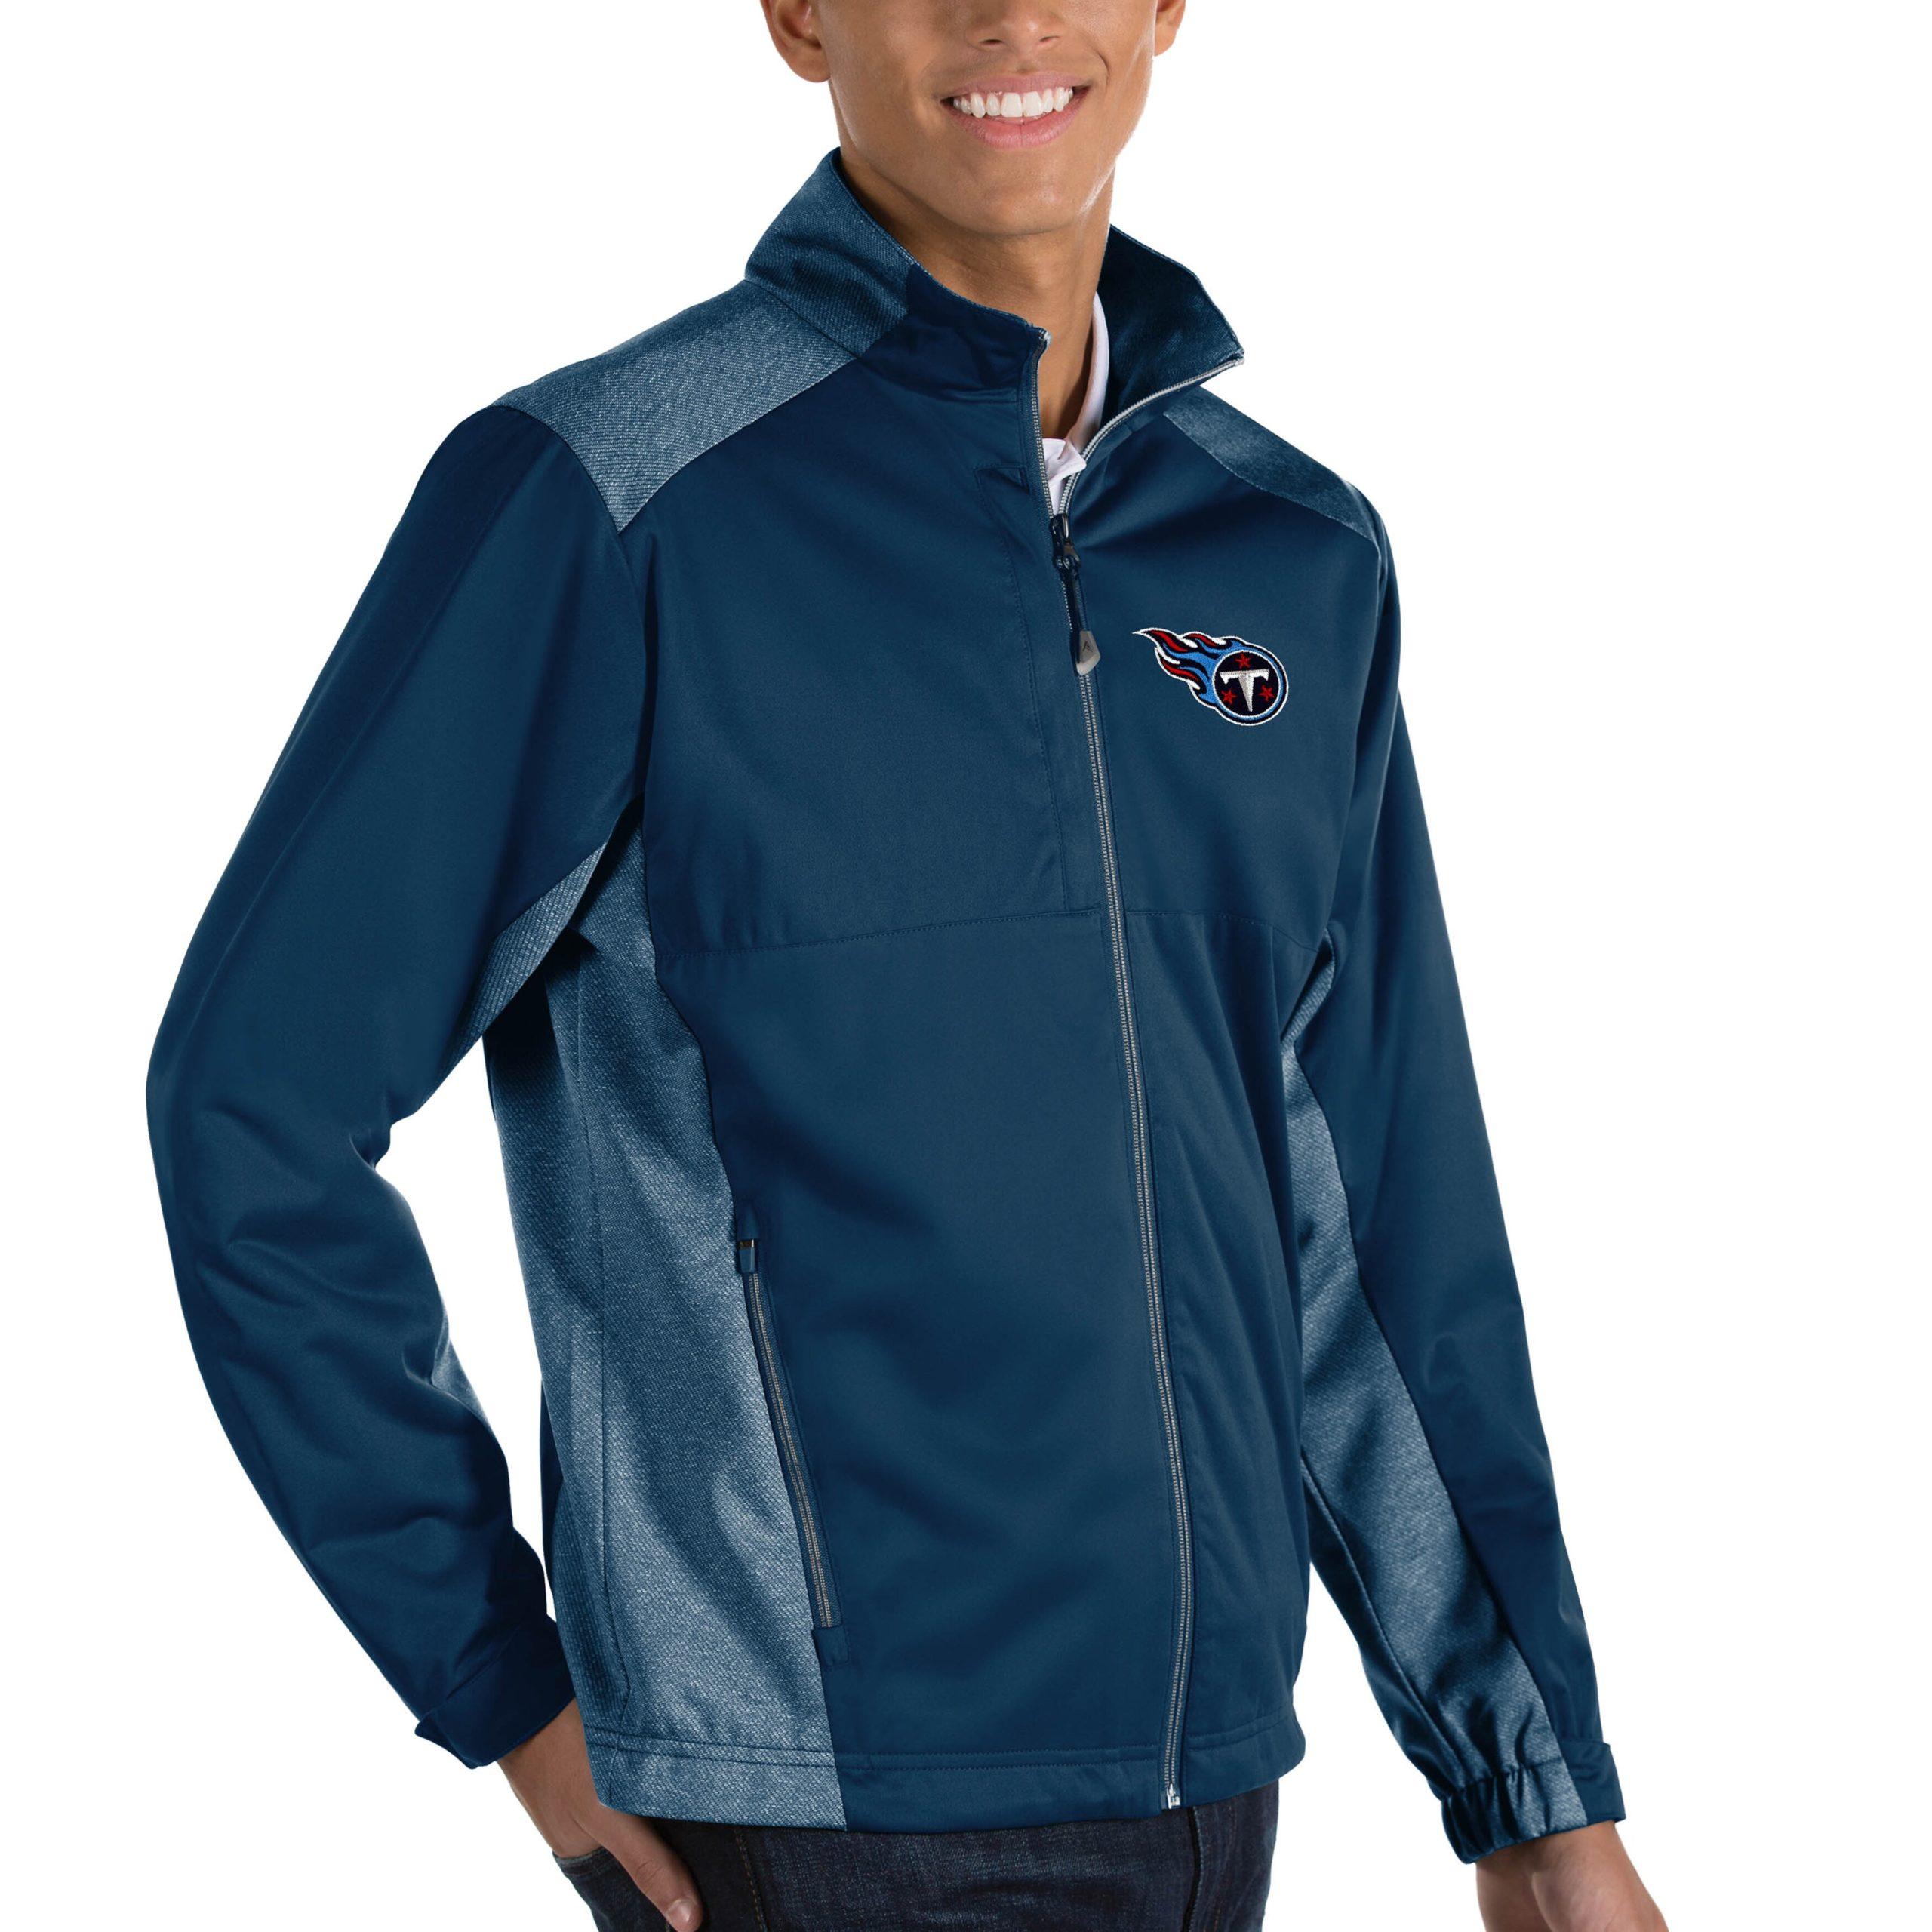 Tennessee Titans Antigua Revolve Big & Tall Full-Zip Jacket - Heather Navy